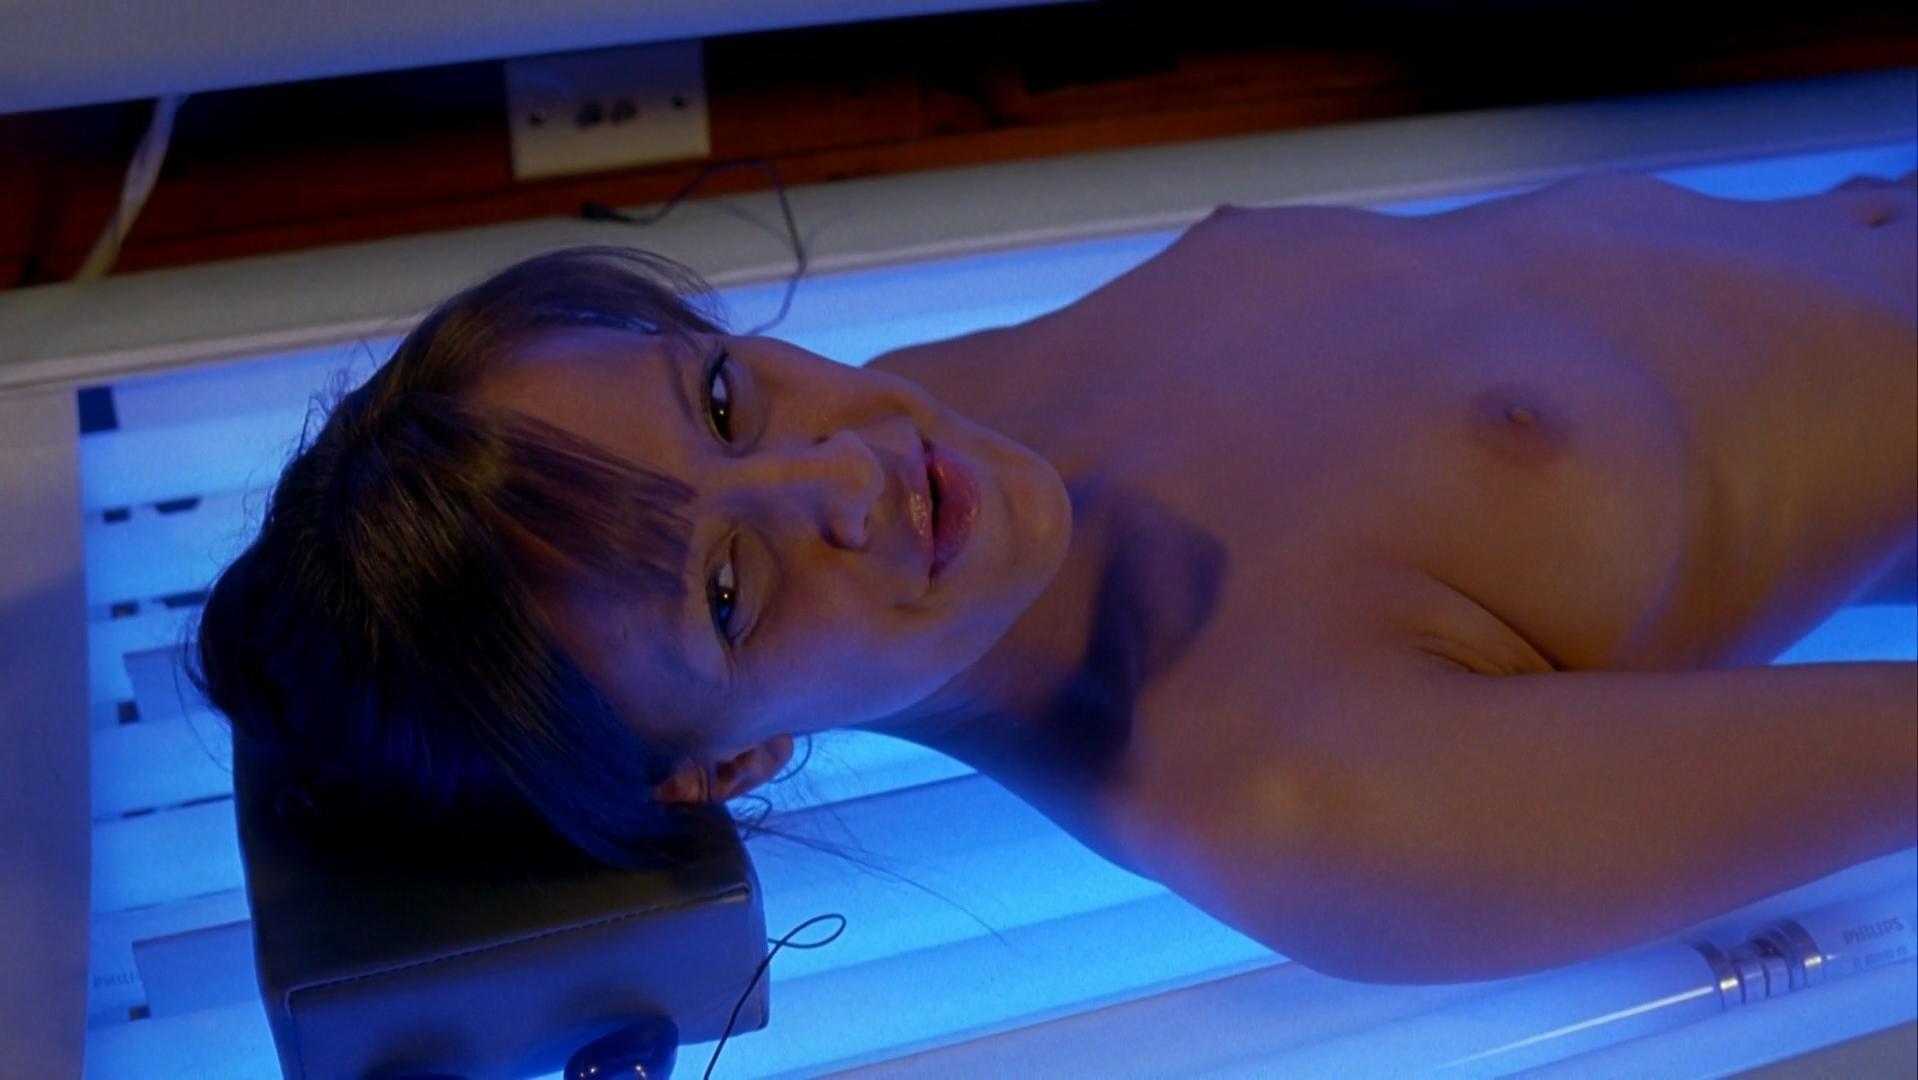 Chelan Simmons nude, Crystal Lowe nude - Final Destination 3 (2006)